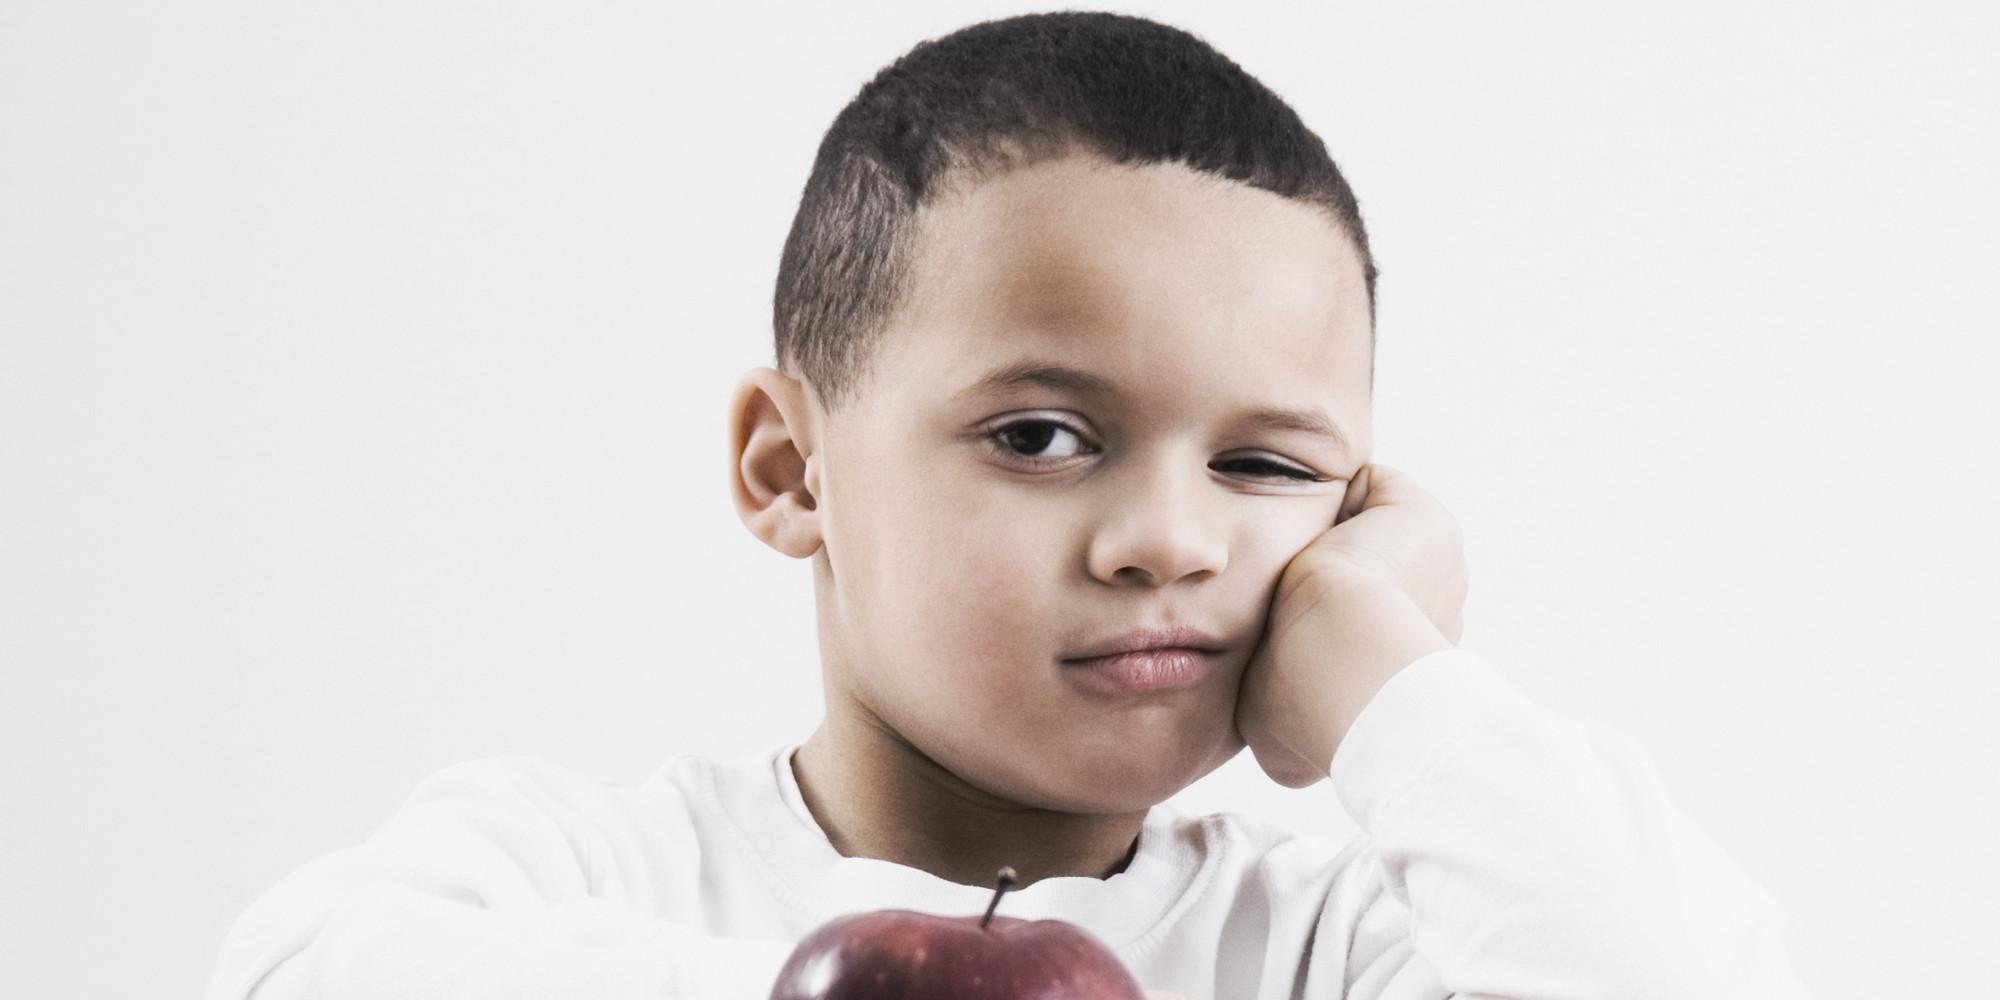 malnutrition affects hispanic children disproportionately